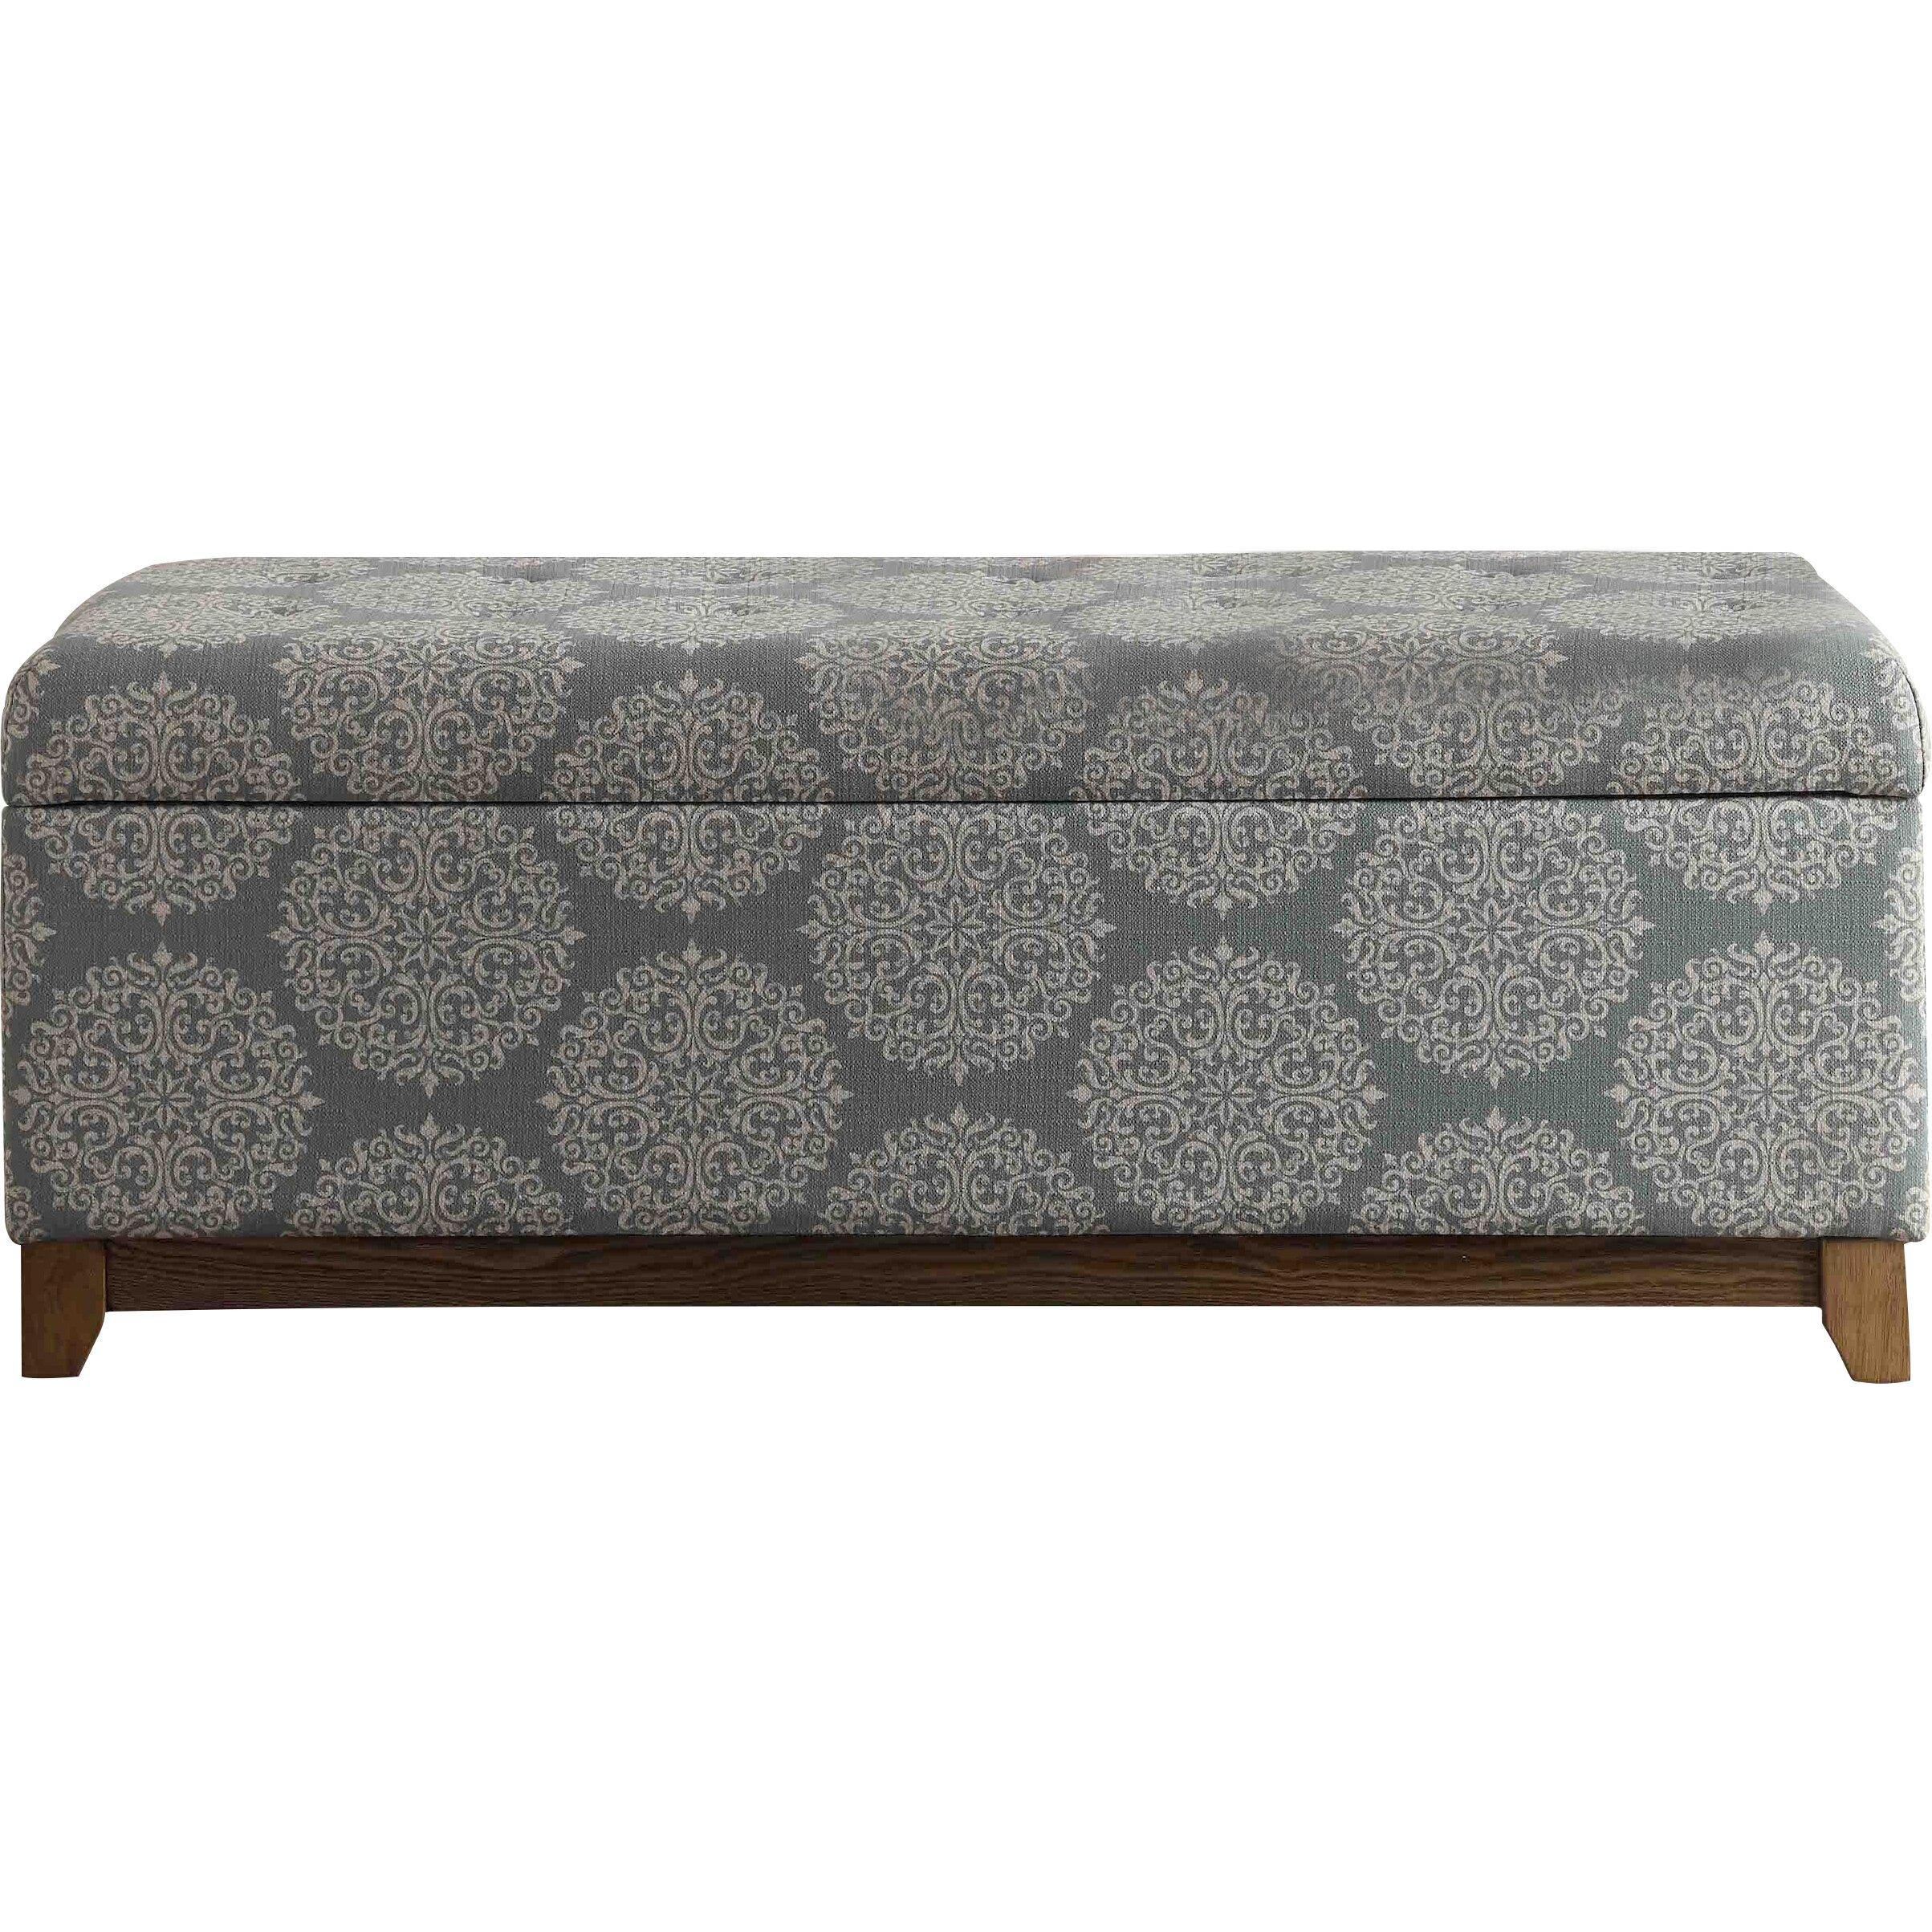 Homepop Storage Bench Reviews: HomePop Apron Wood Storage Bedroom Bench & Reviews